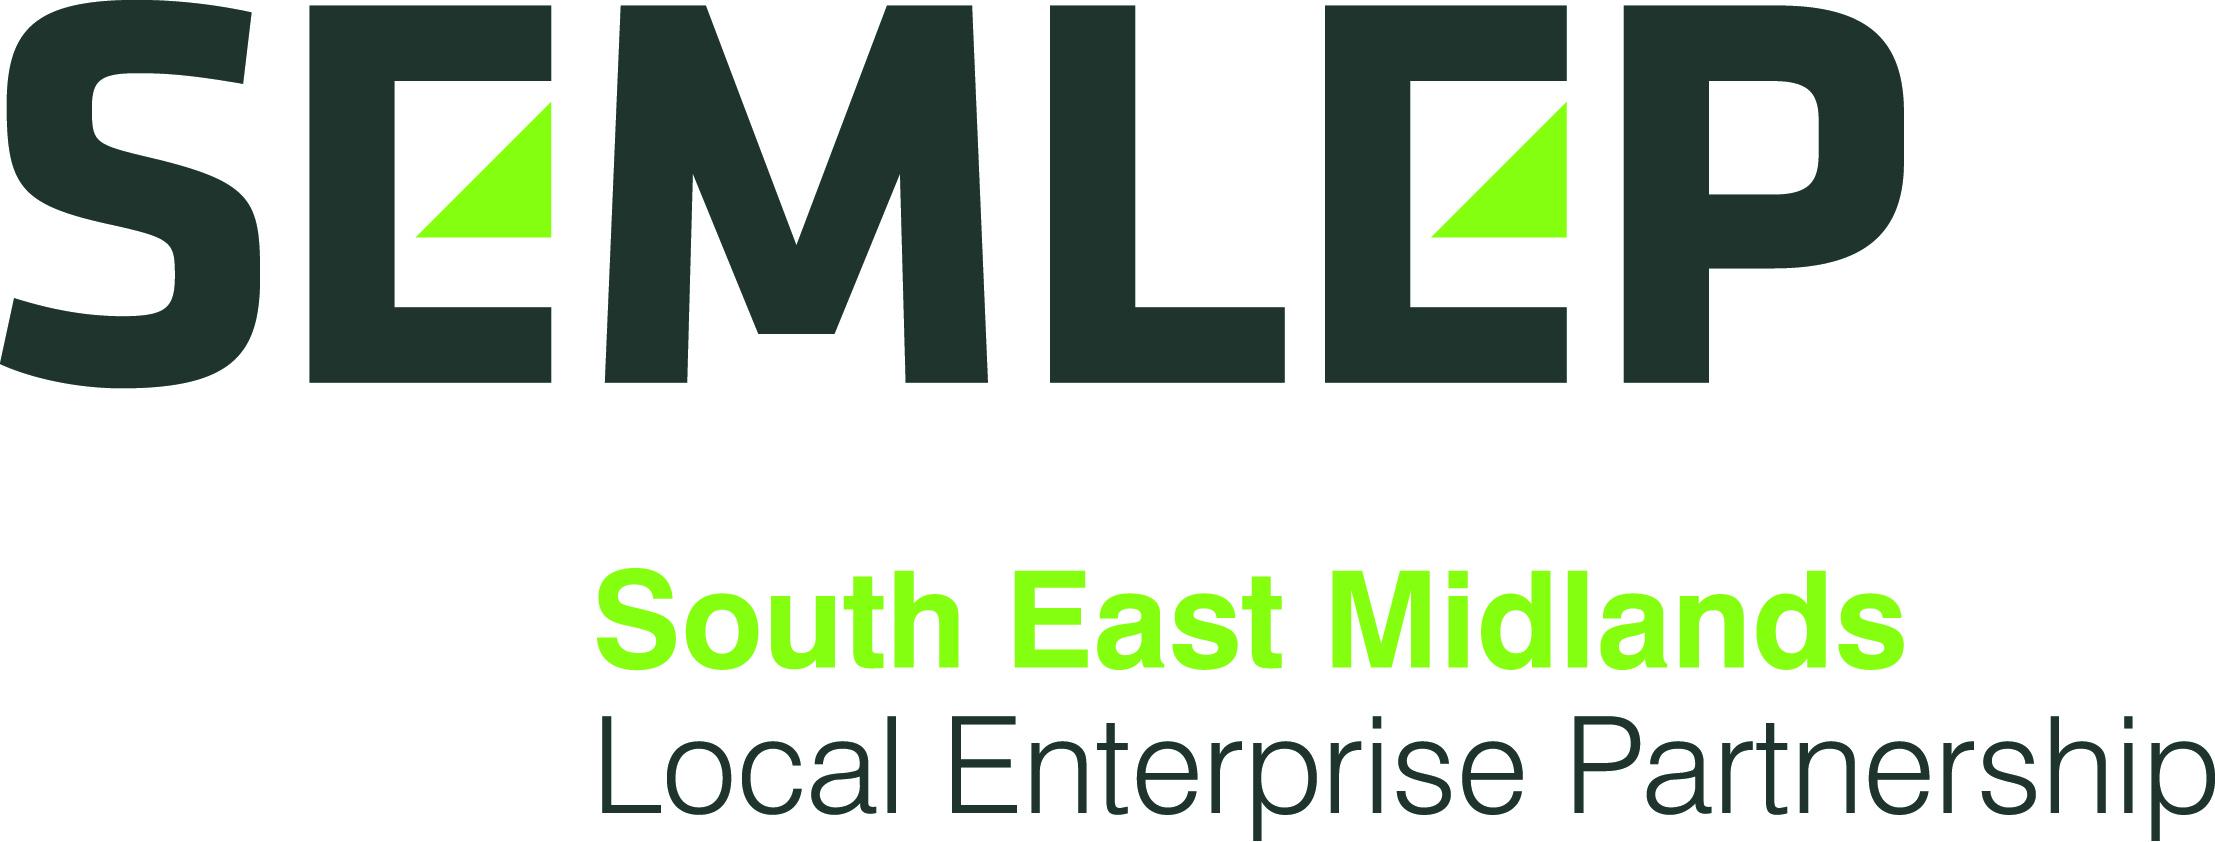 SEMLEP   One East Midlands